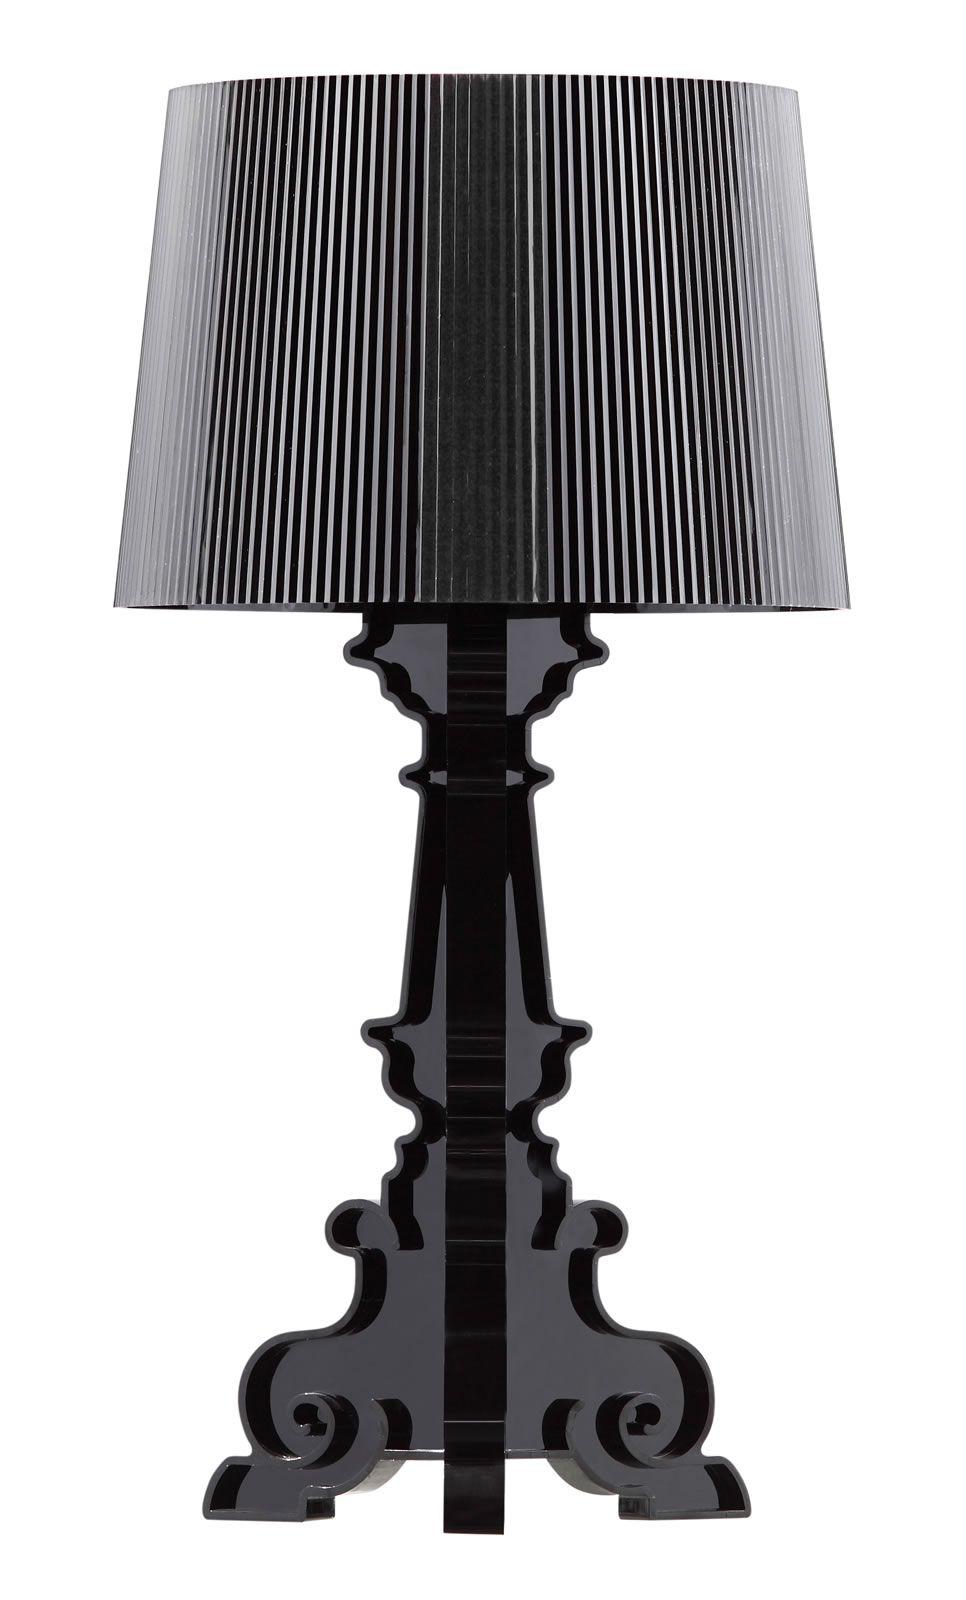 Modern acrylic table lamp centerpiece ideas wedding ideas modern acrylic table lamp centerpiece ideas geotapseo Gallery